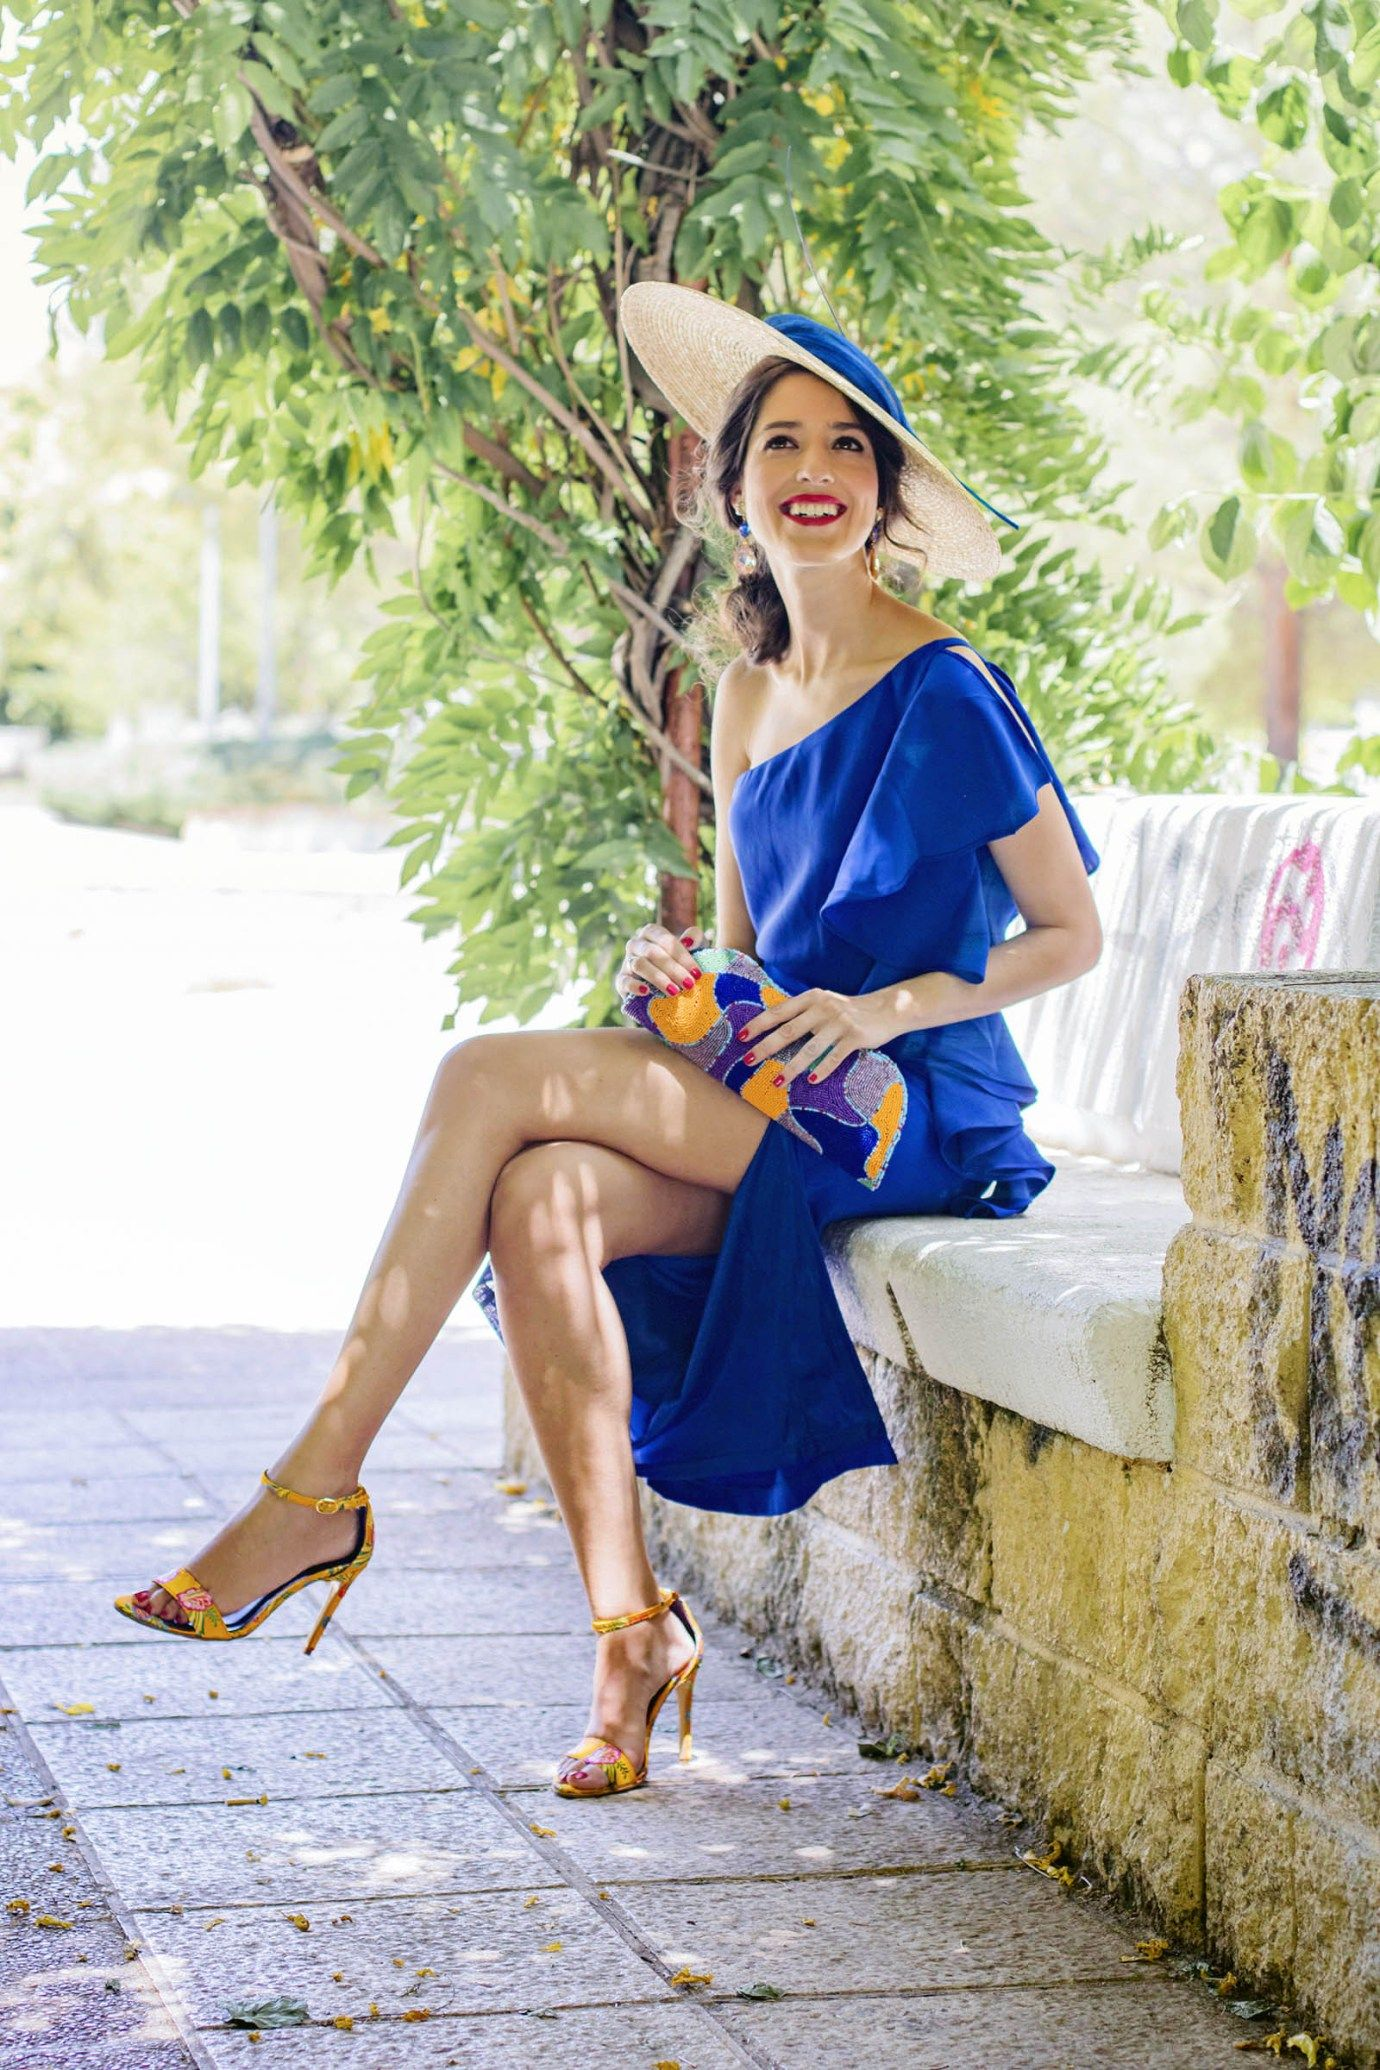 81e318145 Look invitada de mañana: la falda azul | Invitada Perfecta | Moda en ...